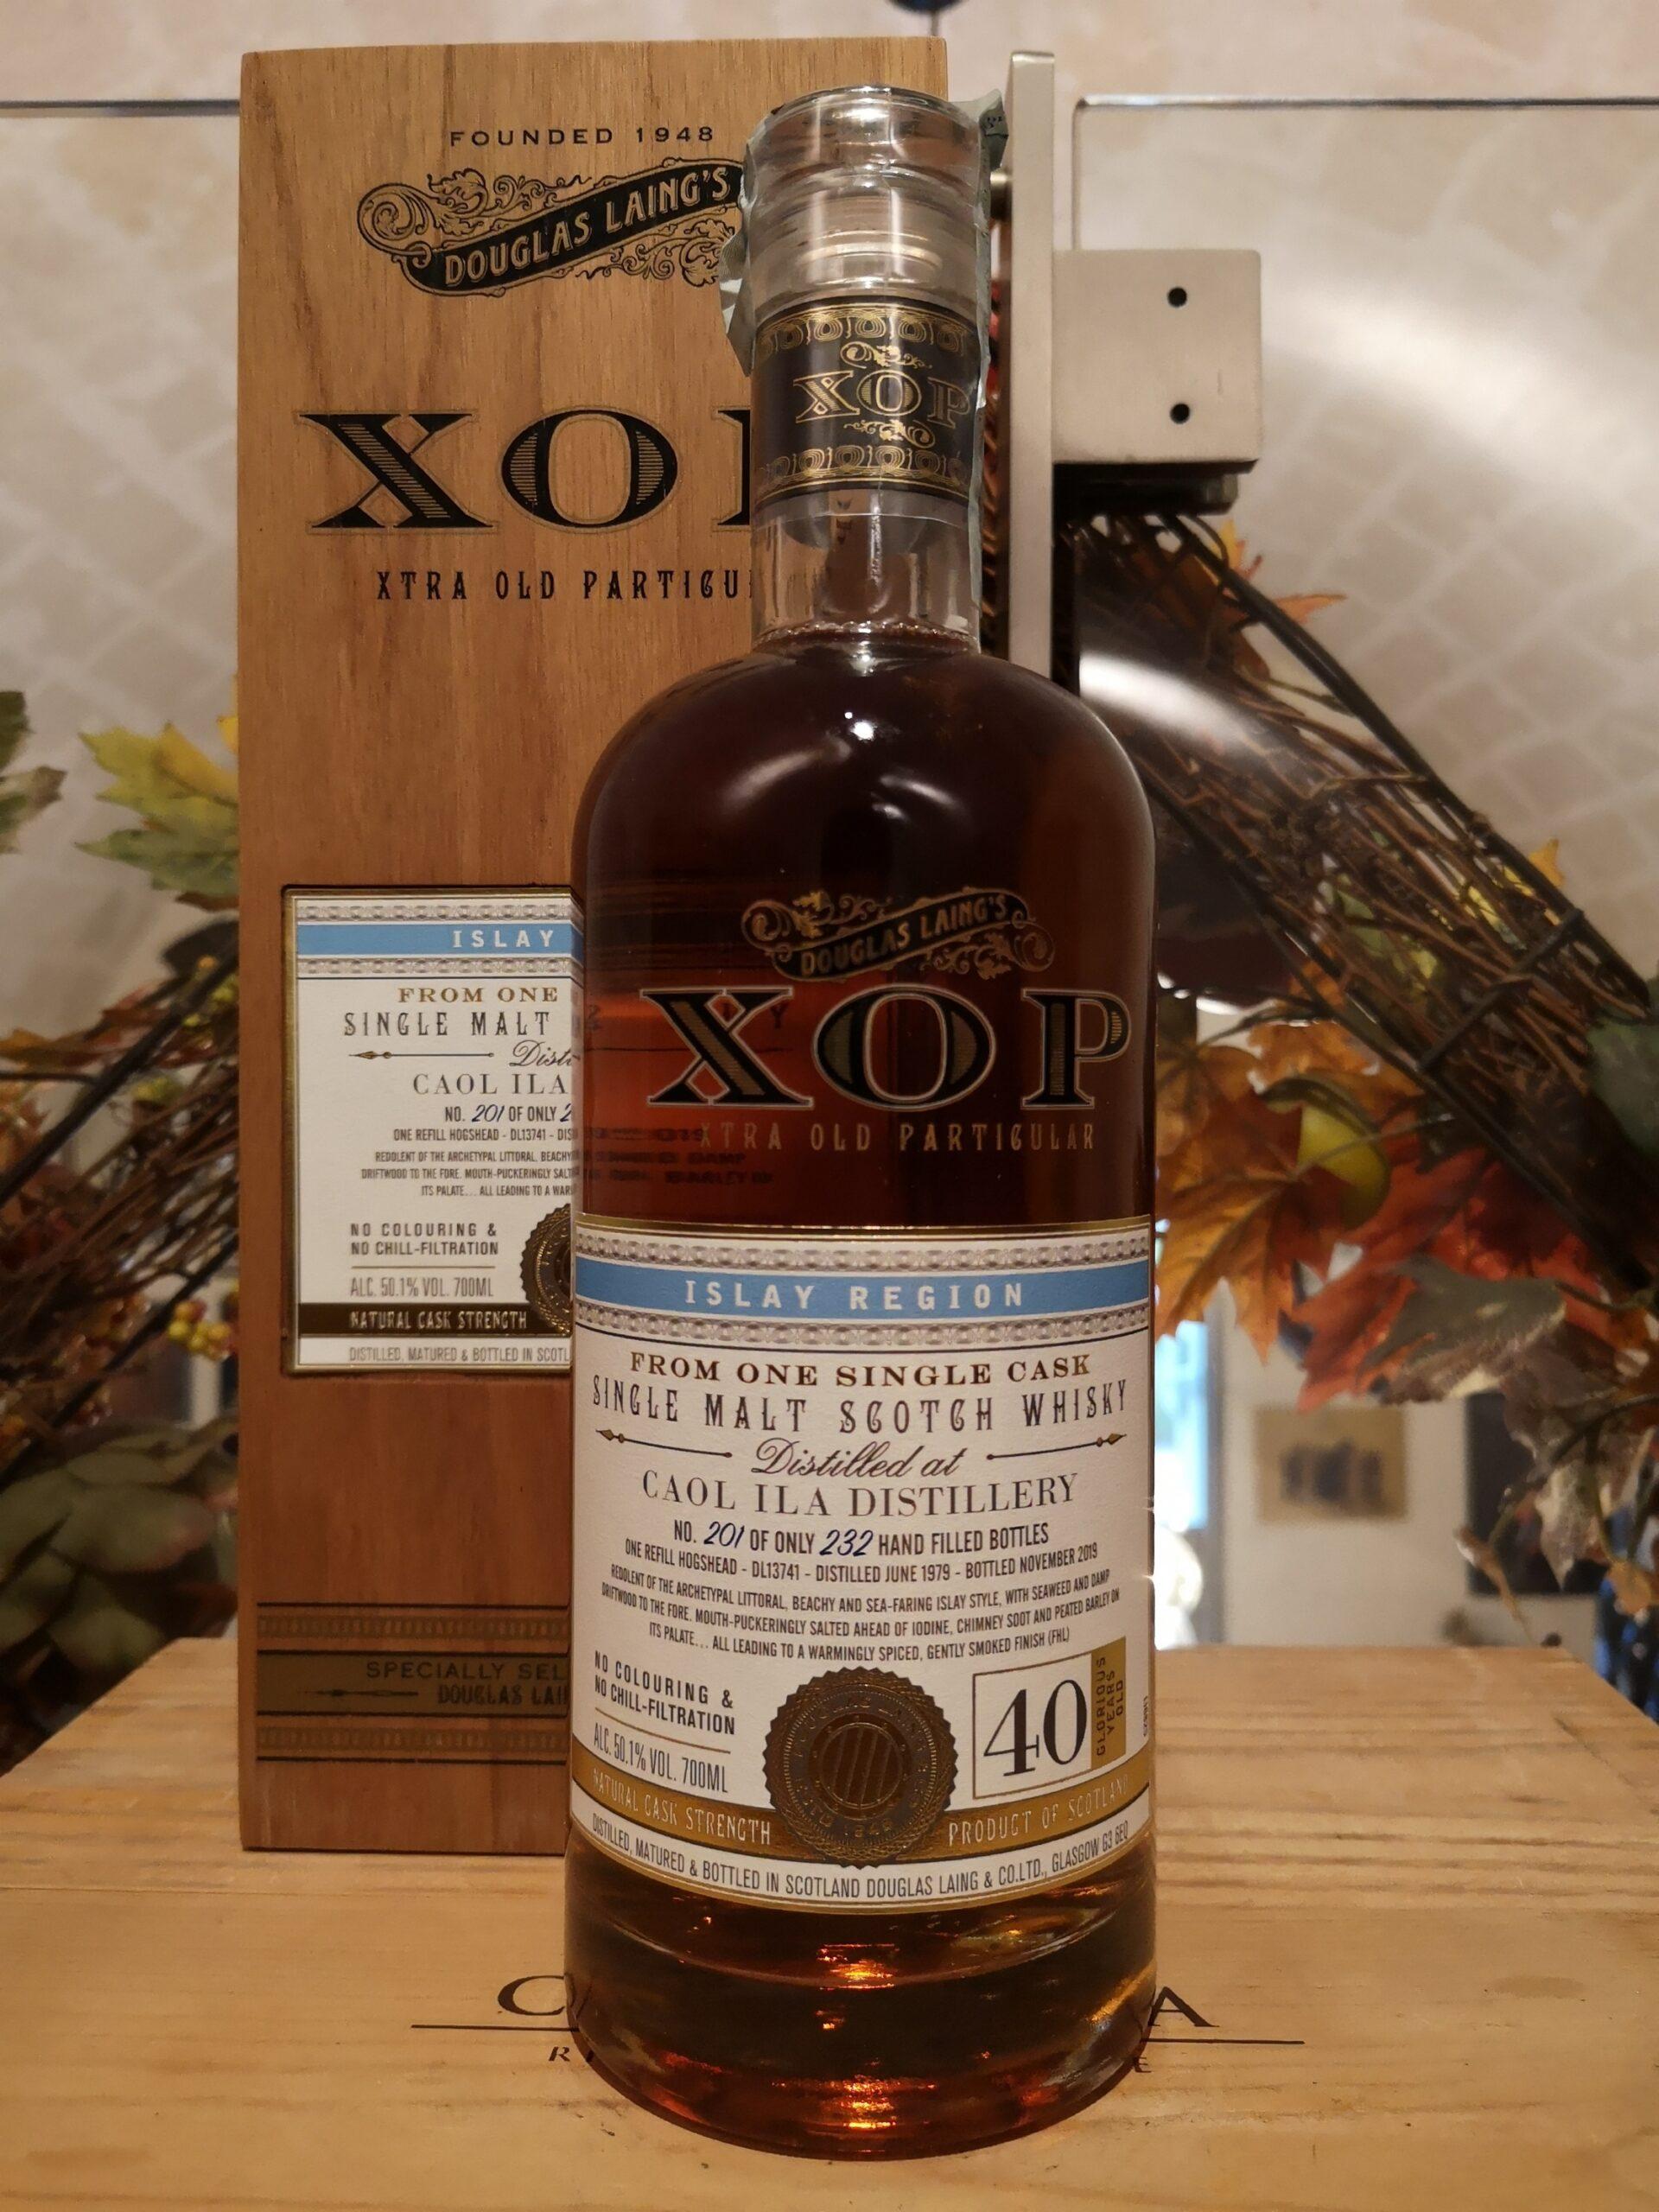 XOP Caol Ila Single Malt Scotch Whisky 1979 40 YO by Douglas Laing